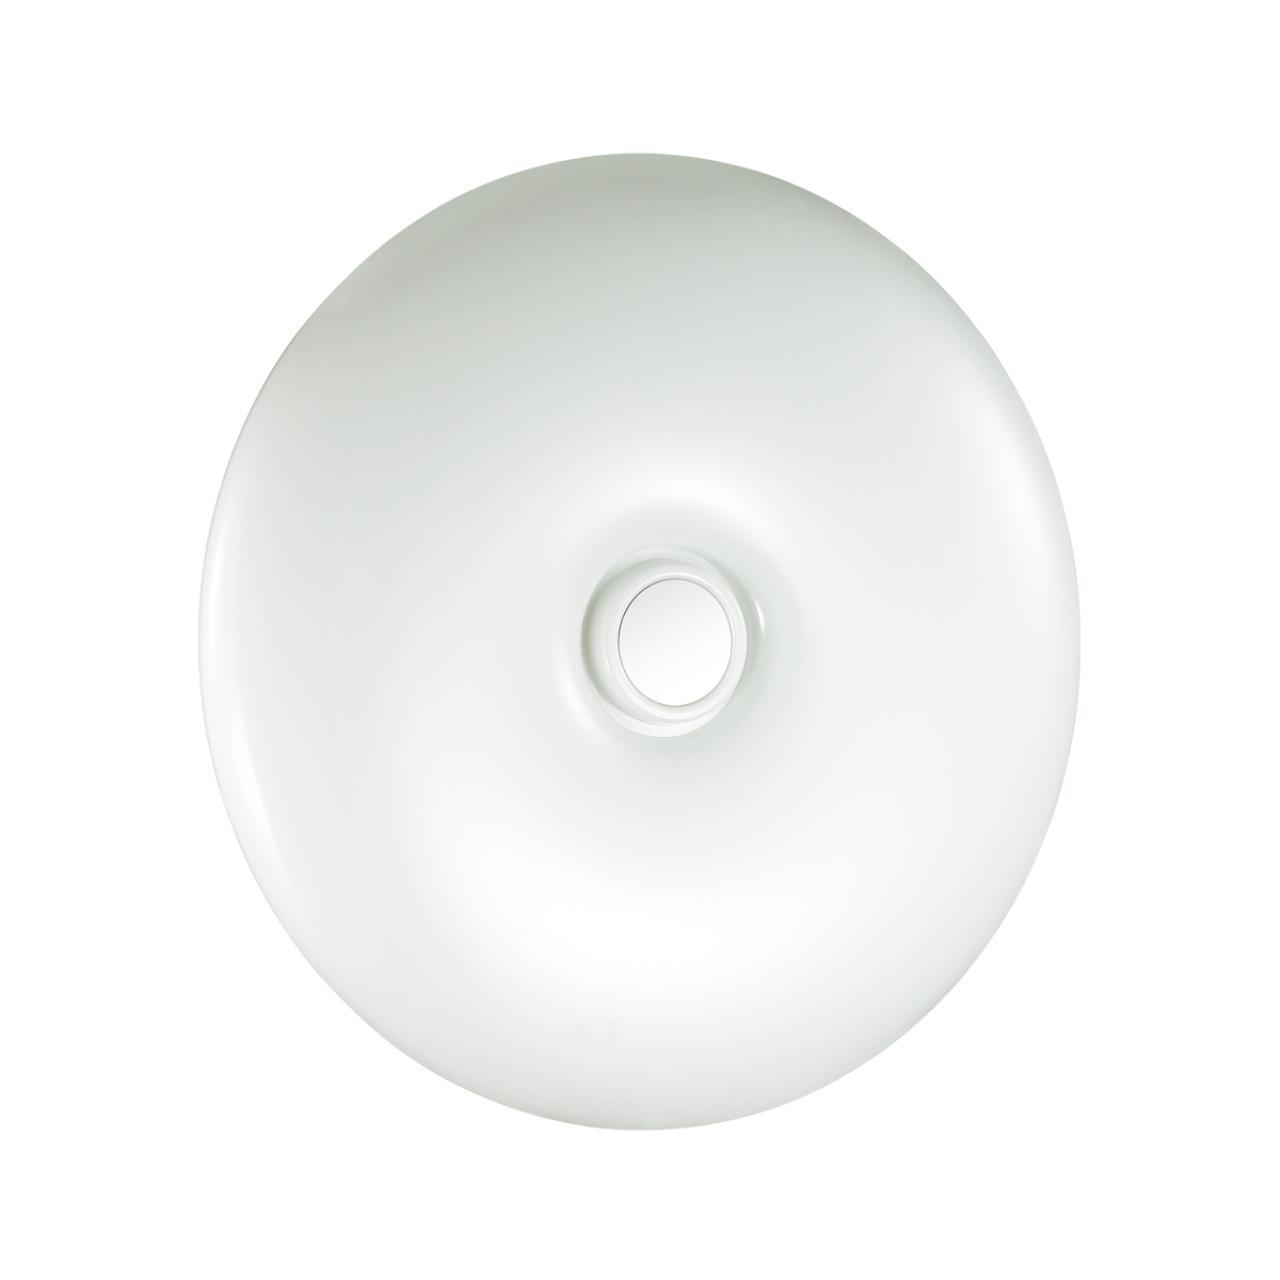 3021/EL SN 024 св-к POINT пластик LED 72Вт 3000-6000K D510 IP43 пульт ДУ